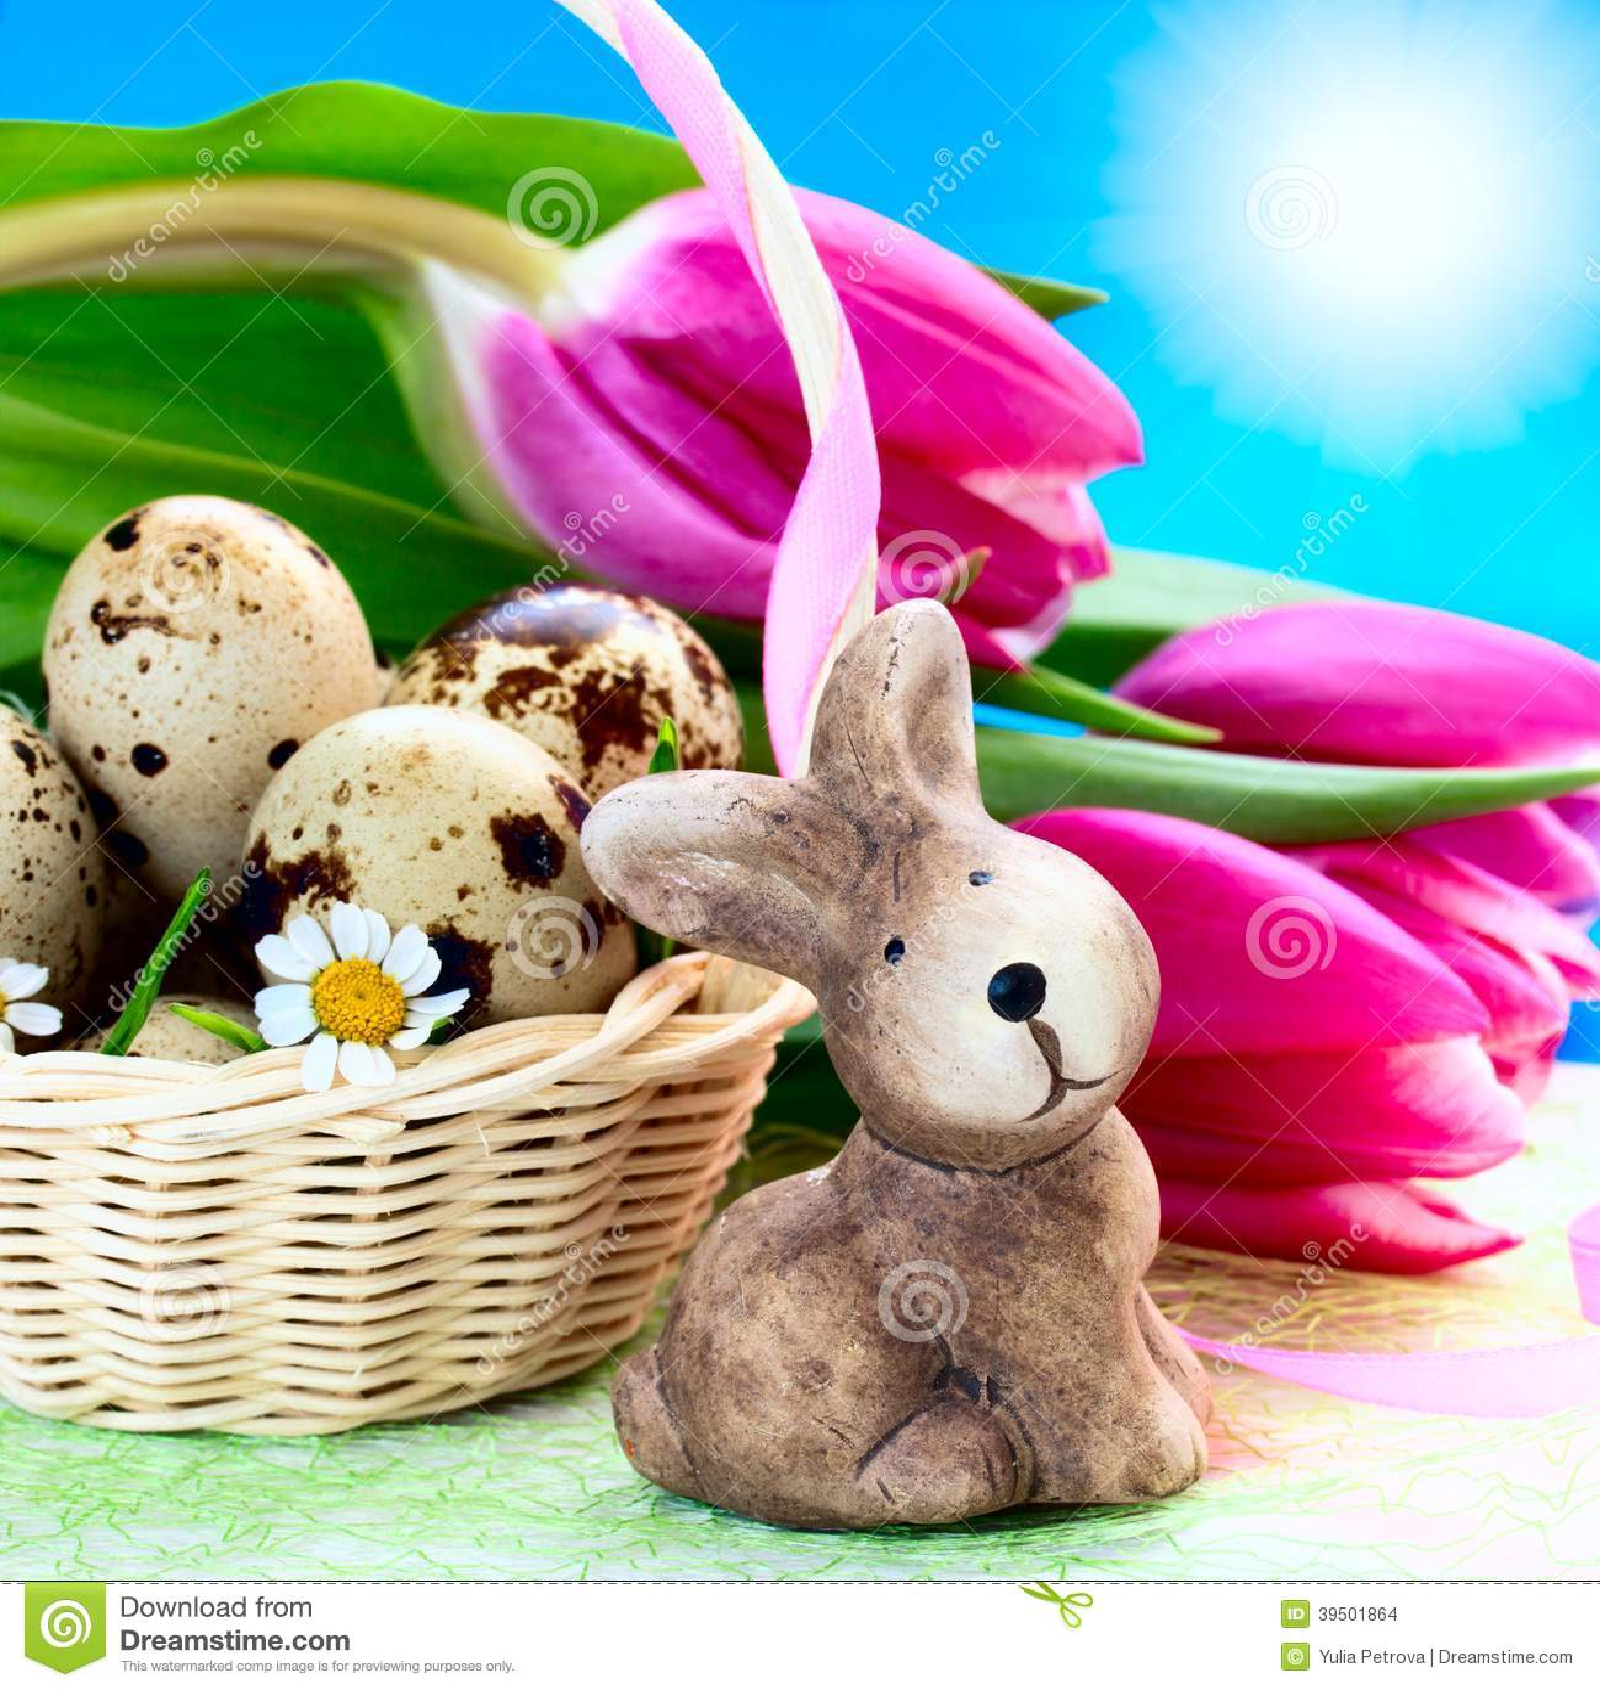 Wielkanocni jajka w króliku i koszu